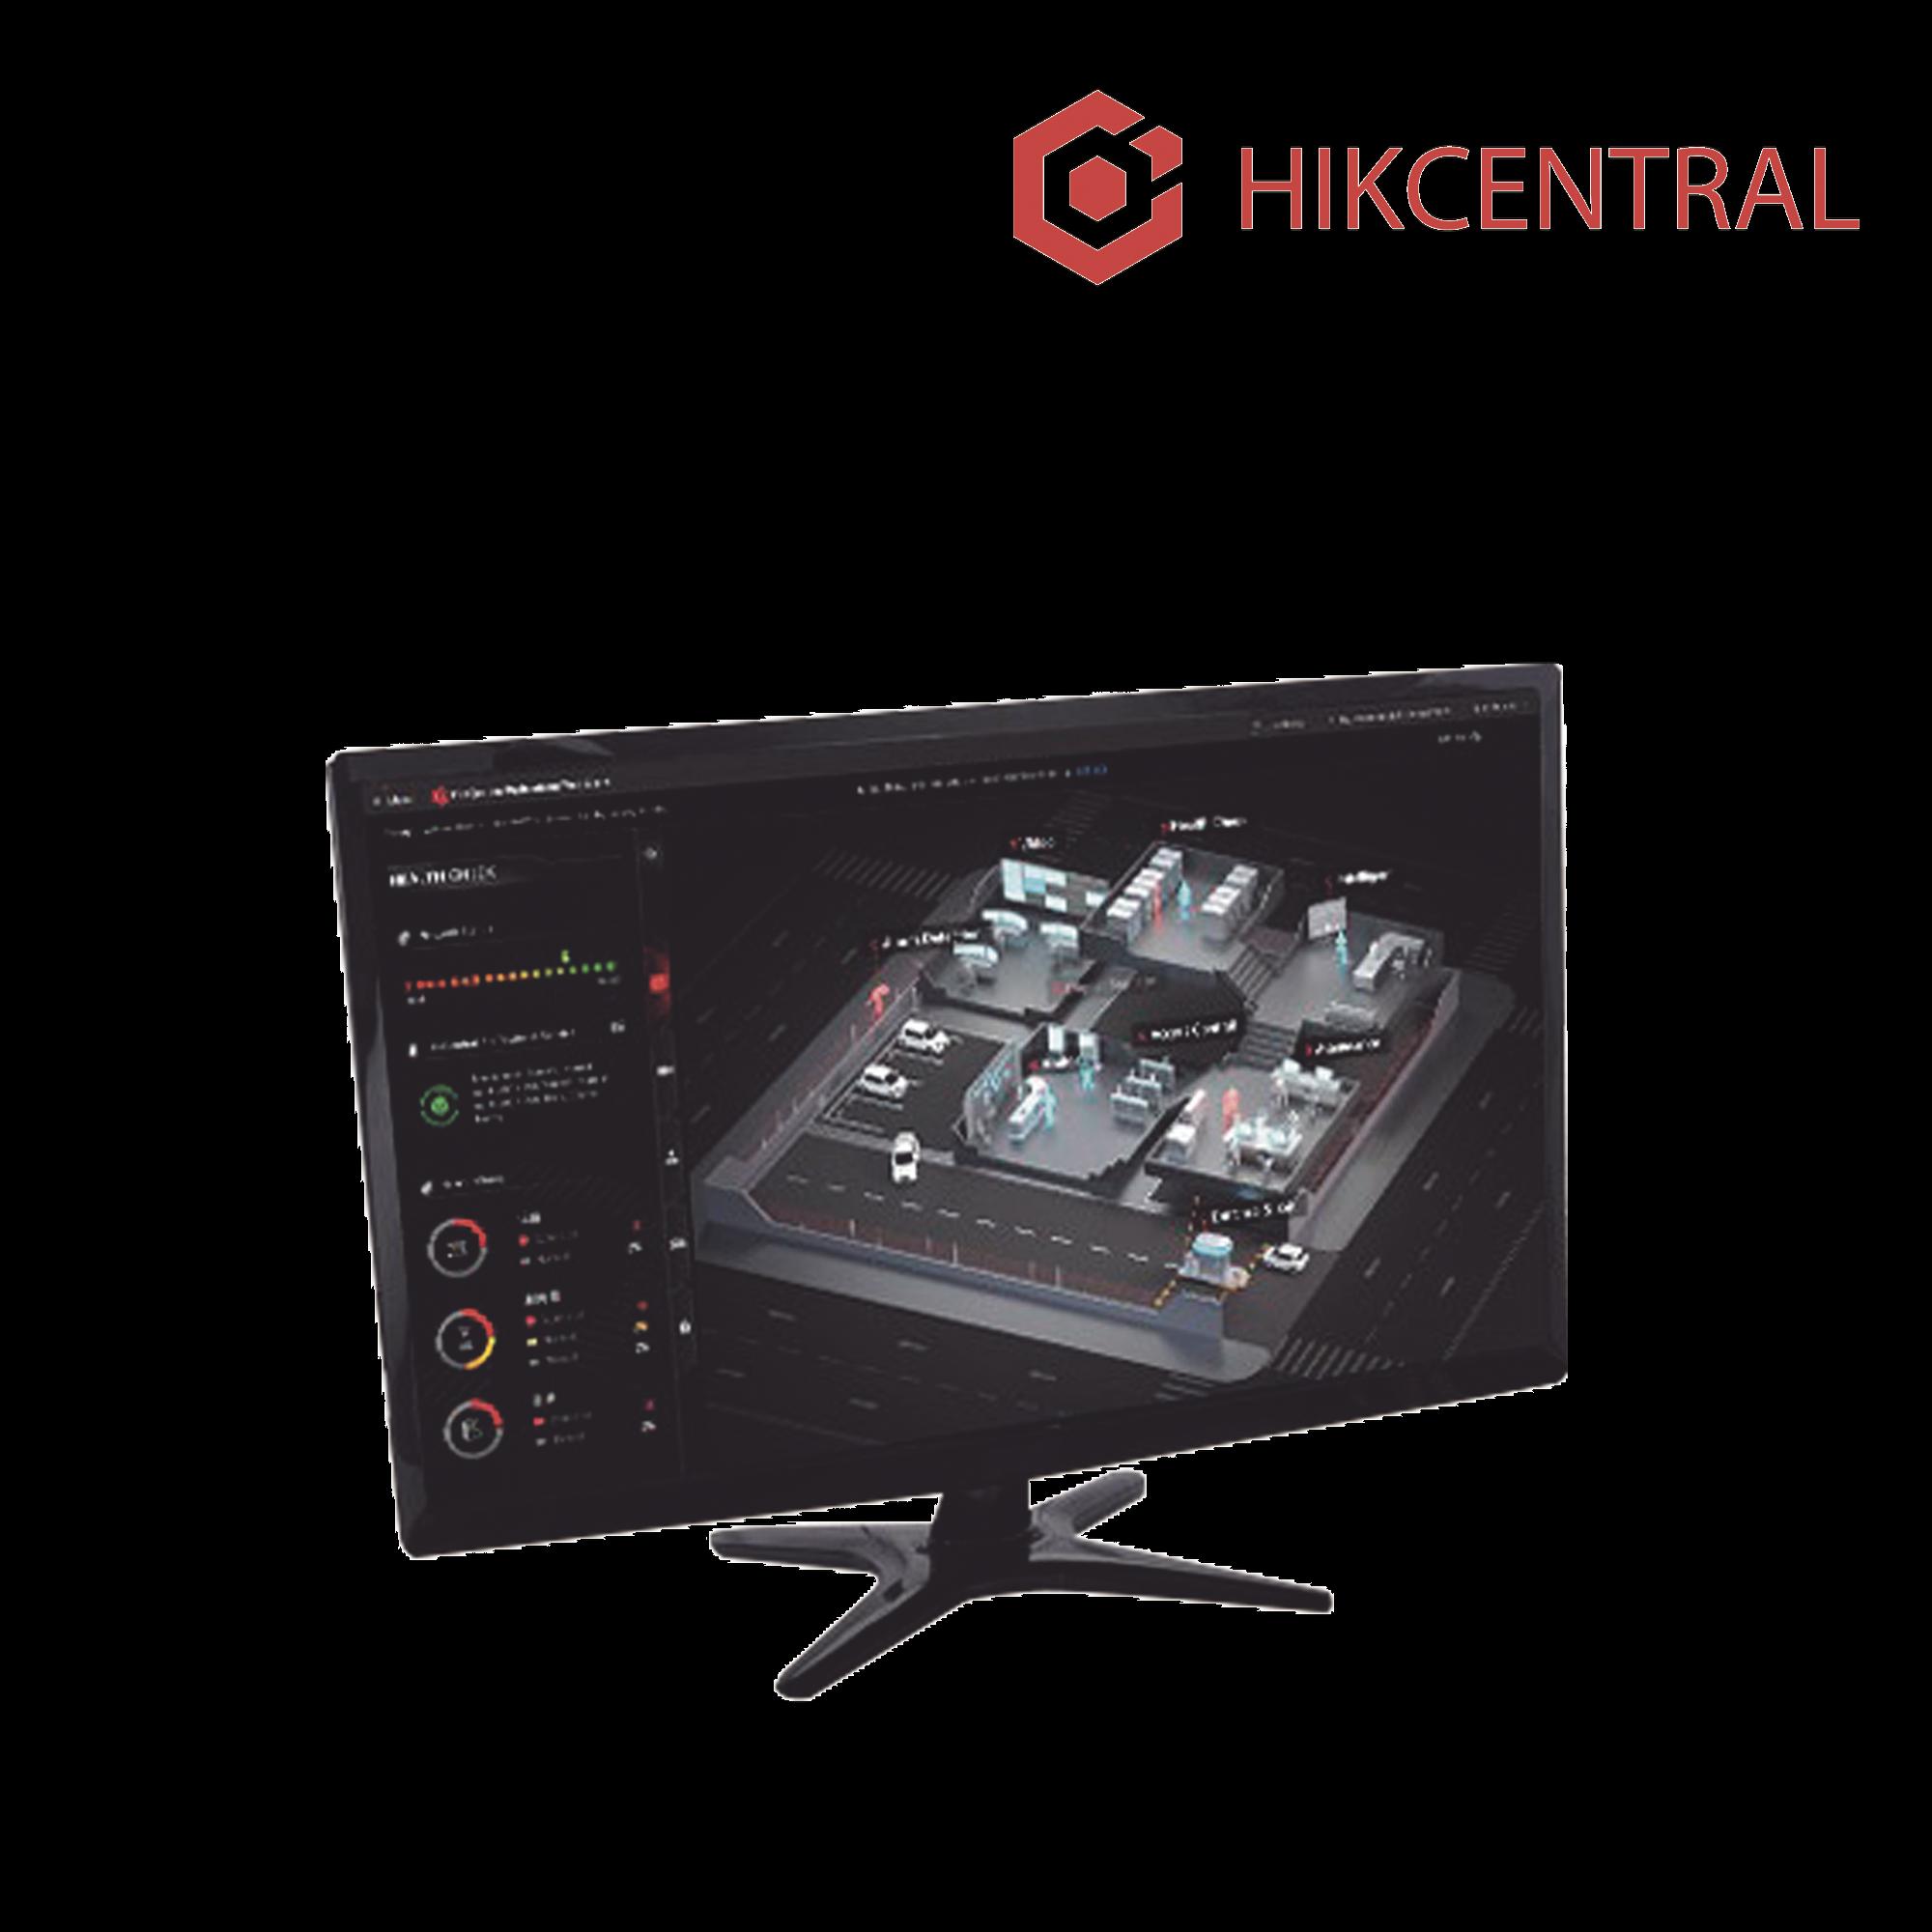 Hik-Central / Licencia para Agregar 1 Canal Adicional de Video (HikCentral-P-VSS-1Ch)